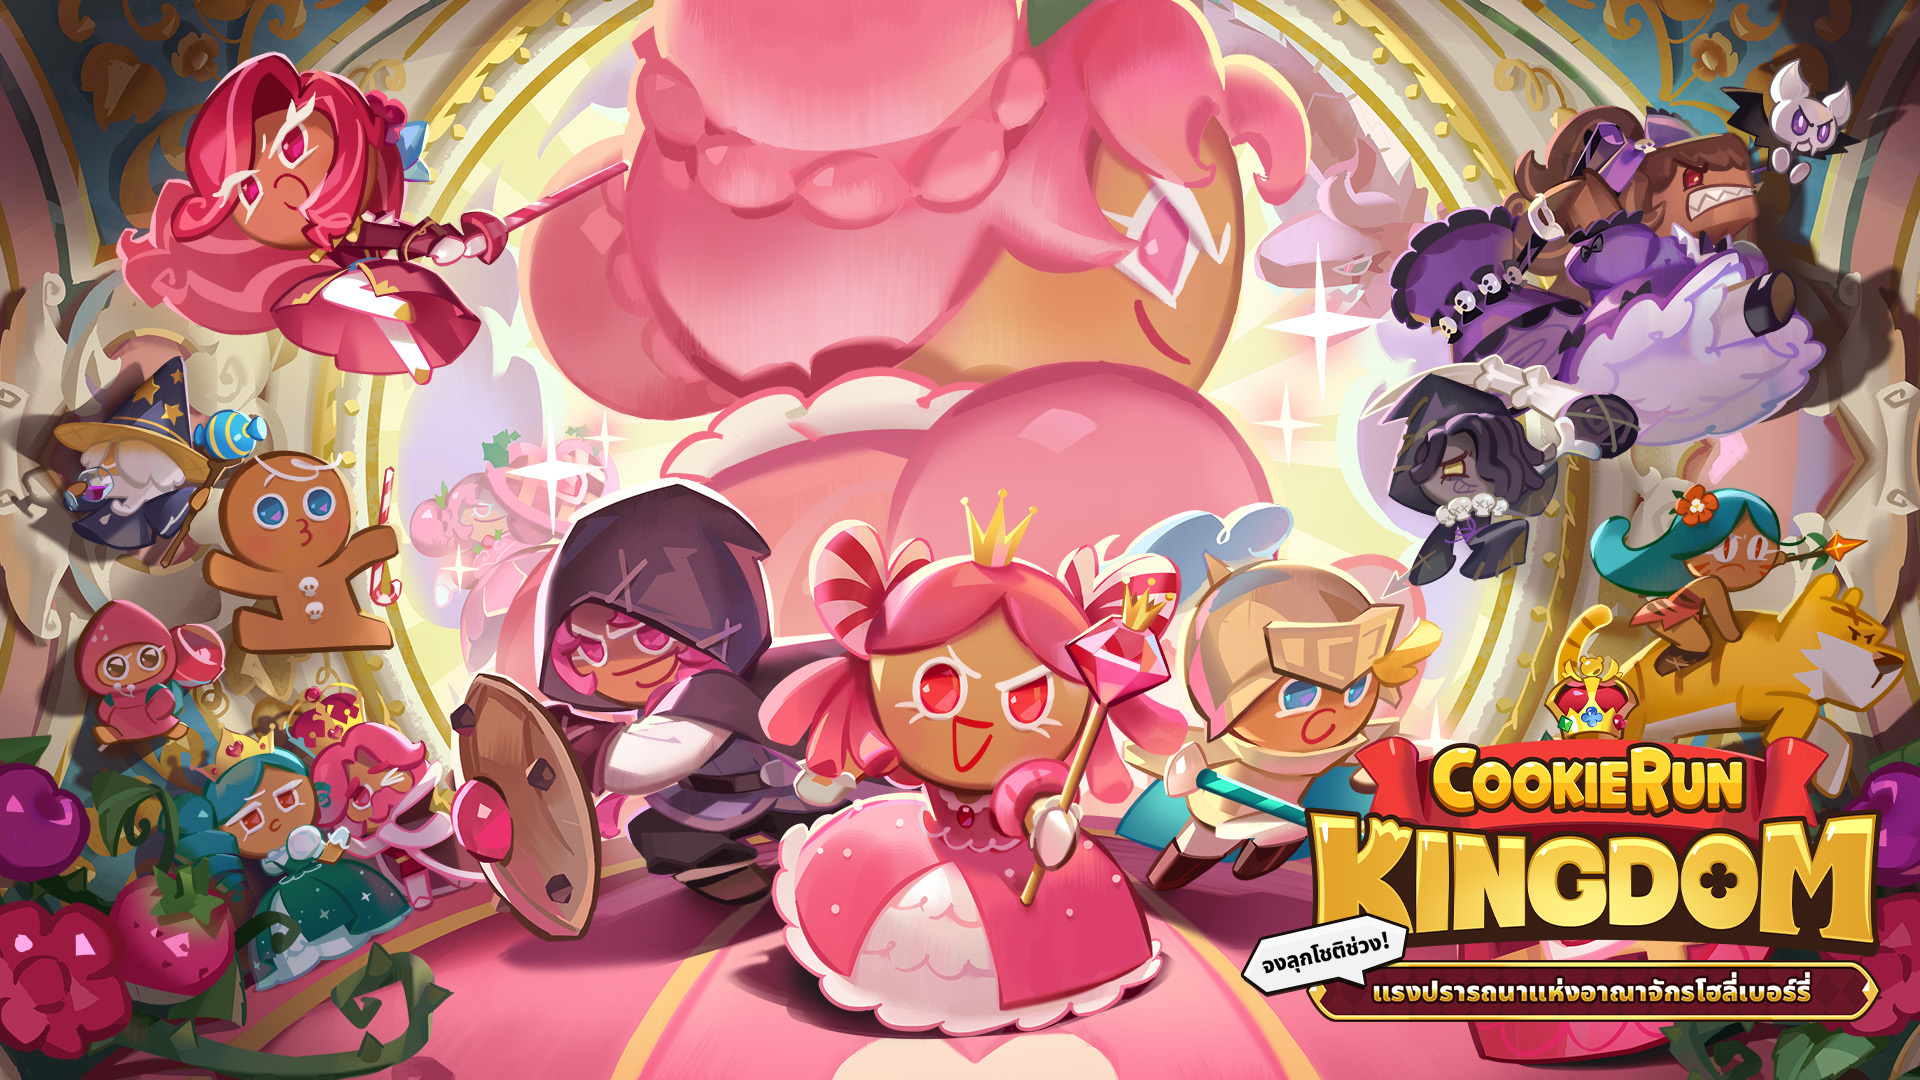 CookieRun Kingdom 292021 1